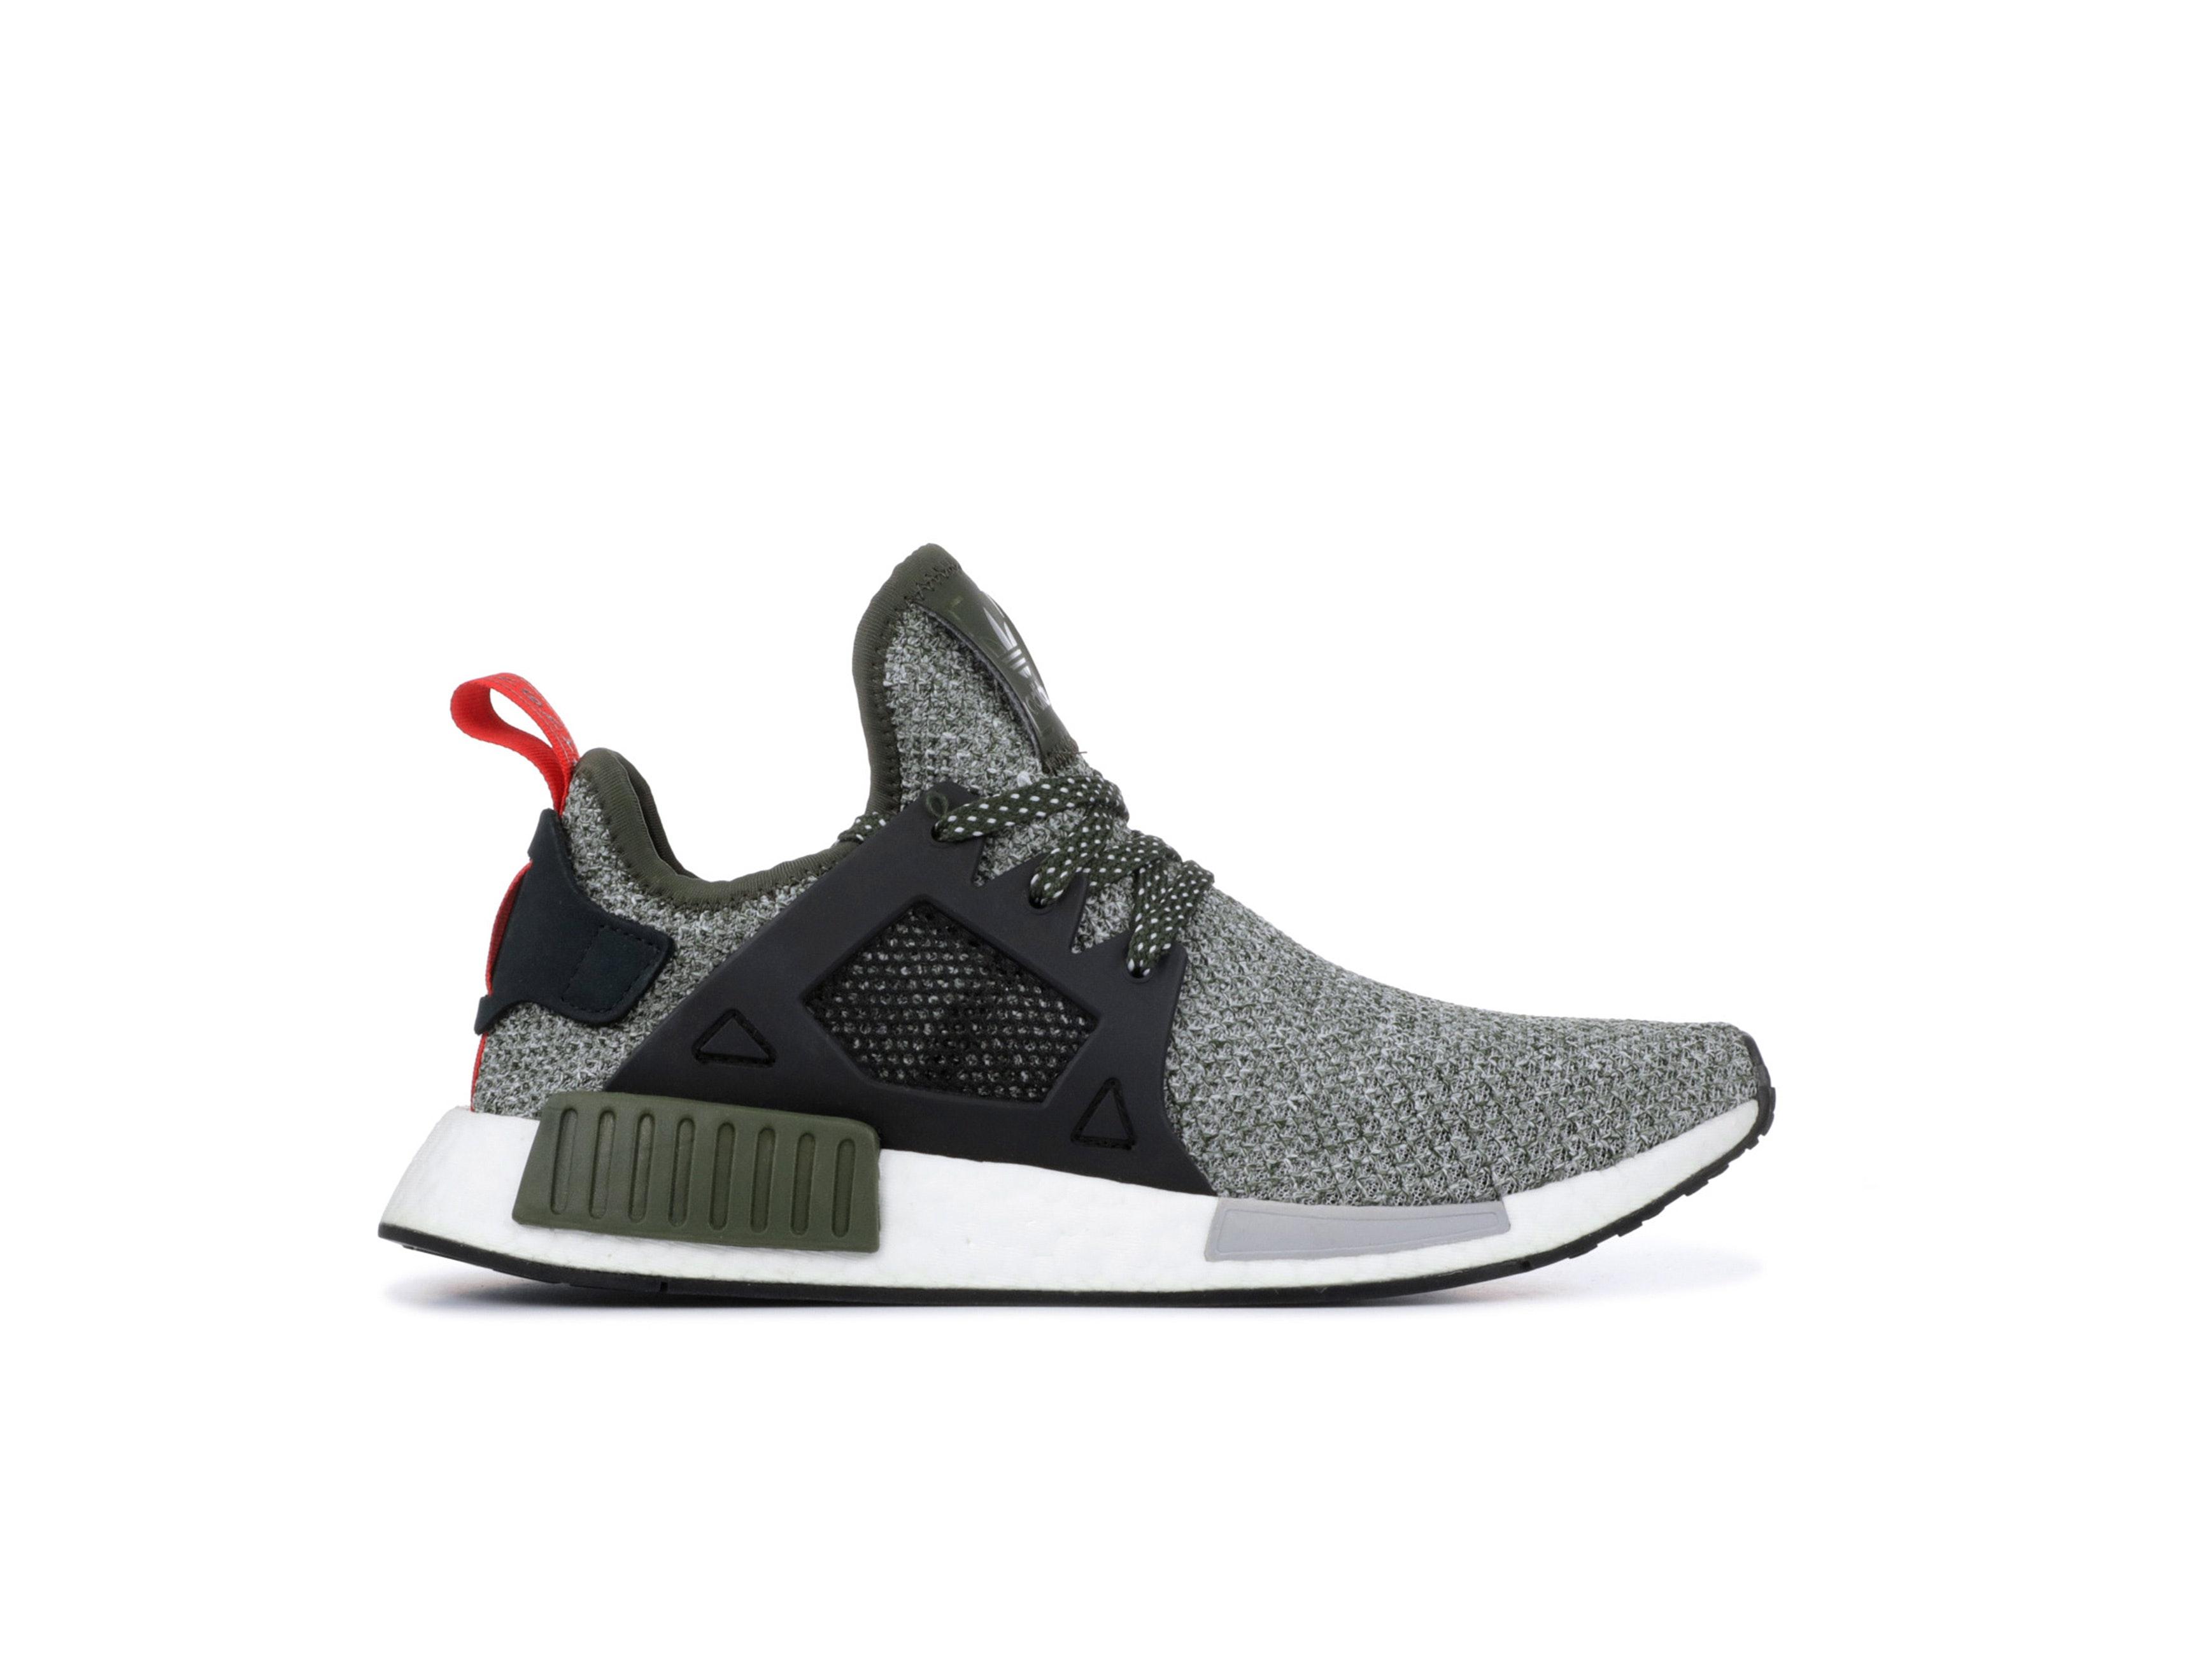 c6df6448 Shop Black Grey NMD XR1 Online | Laced